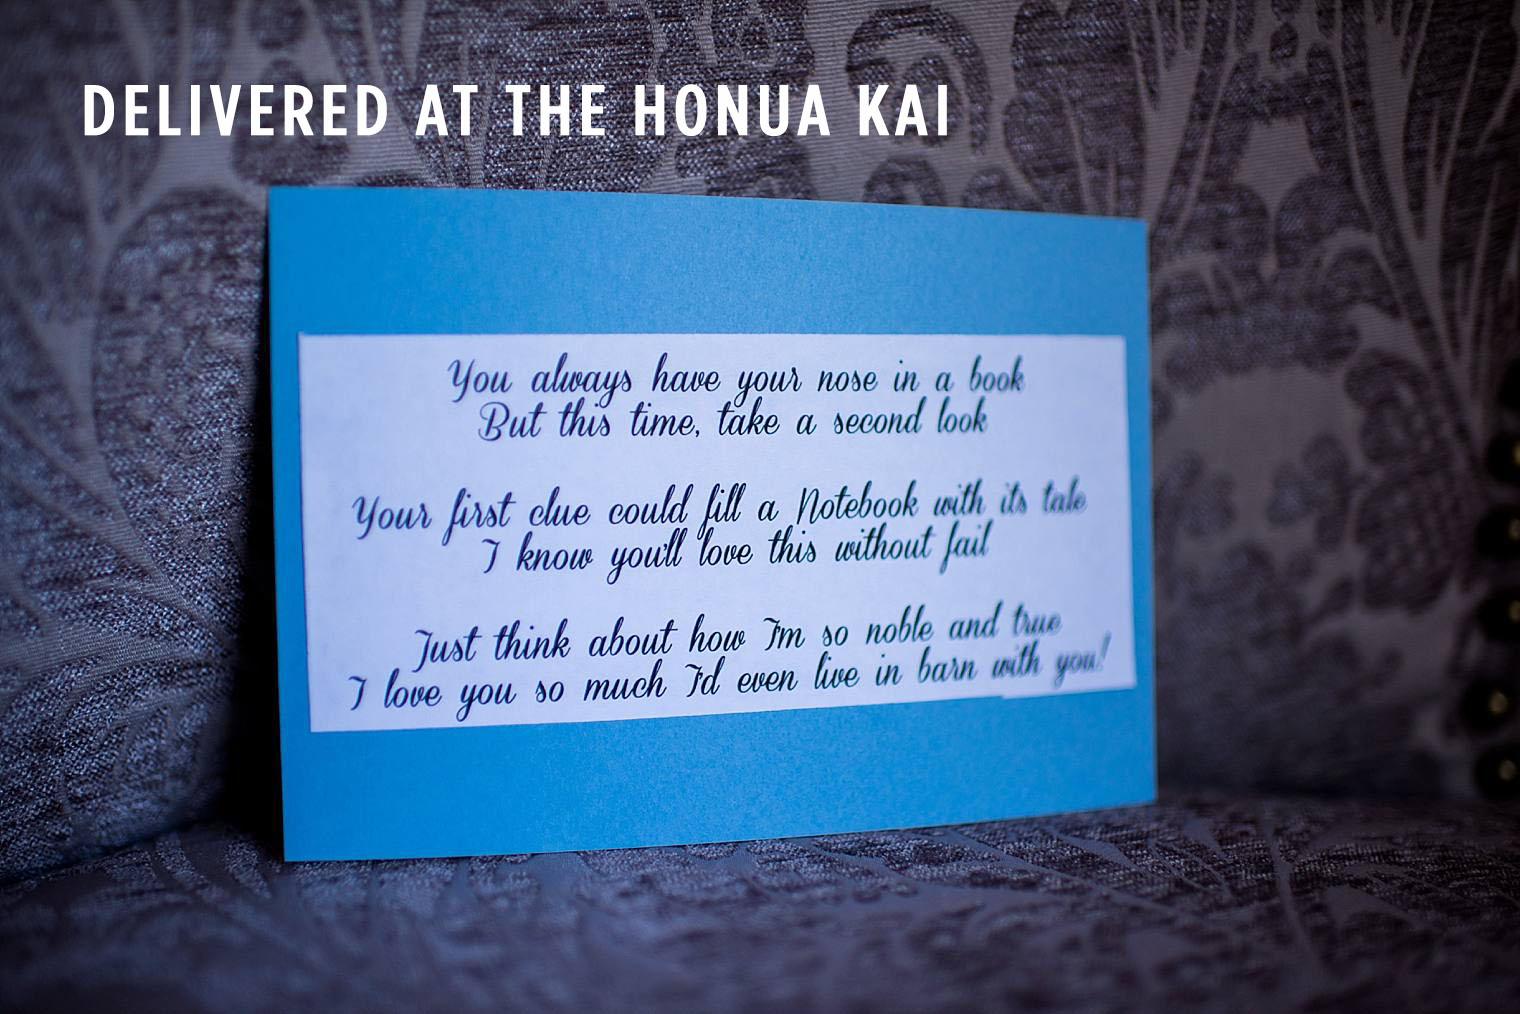 second clue for proposal scavenger hunt